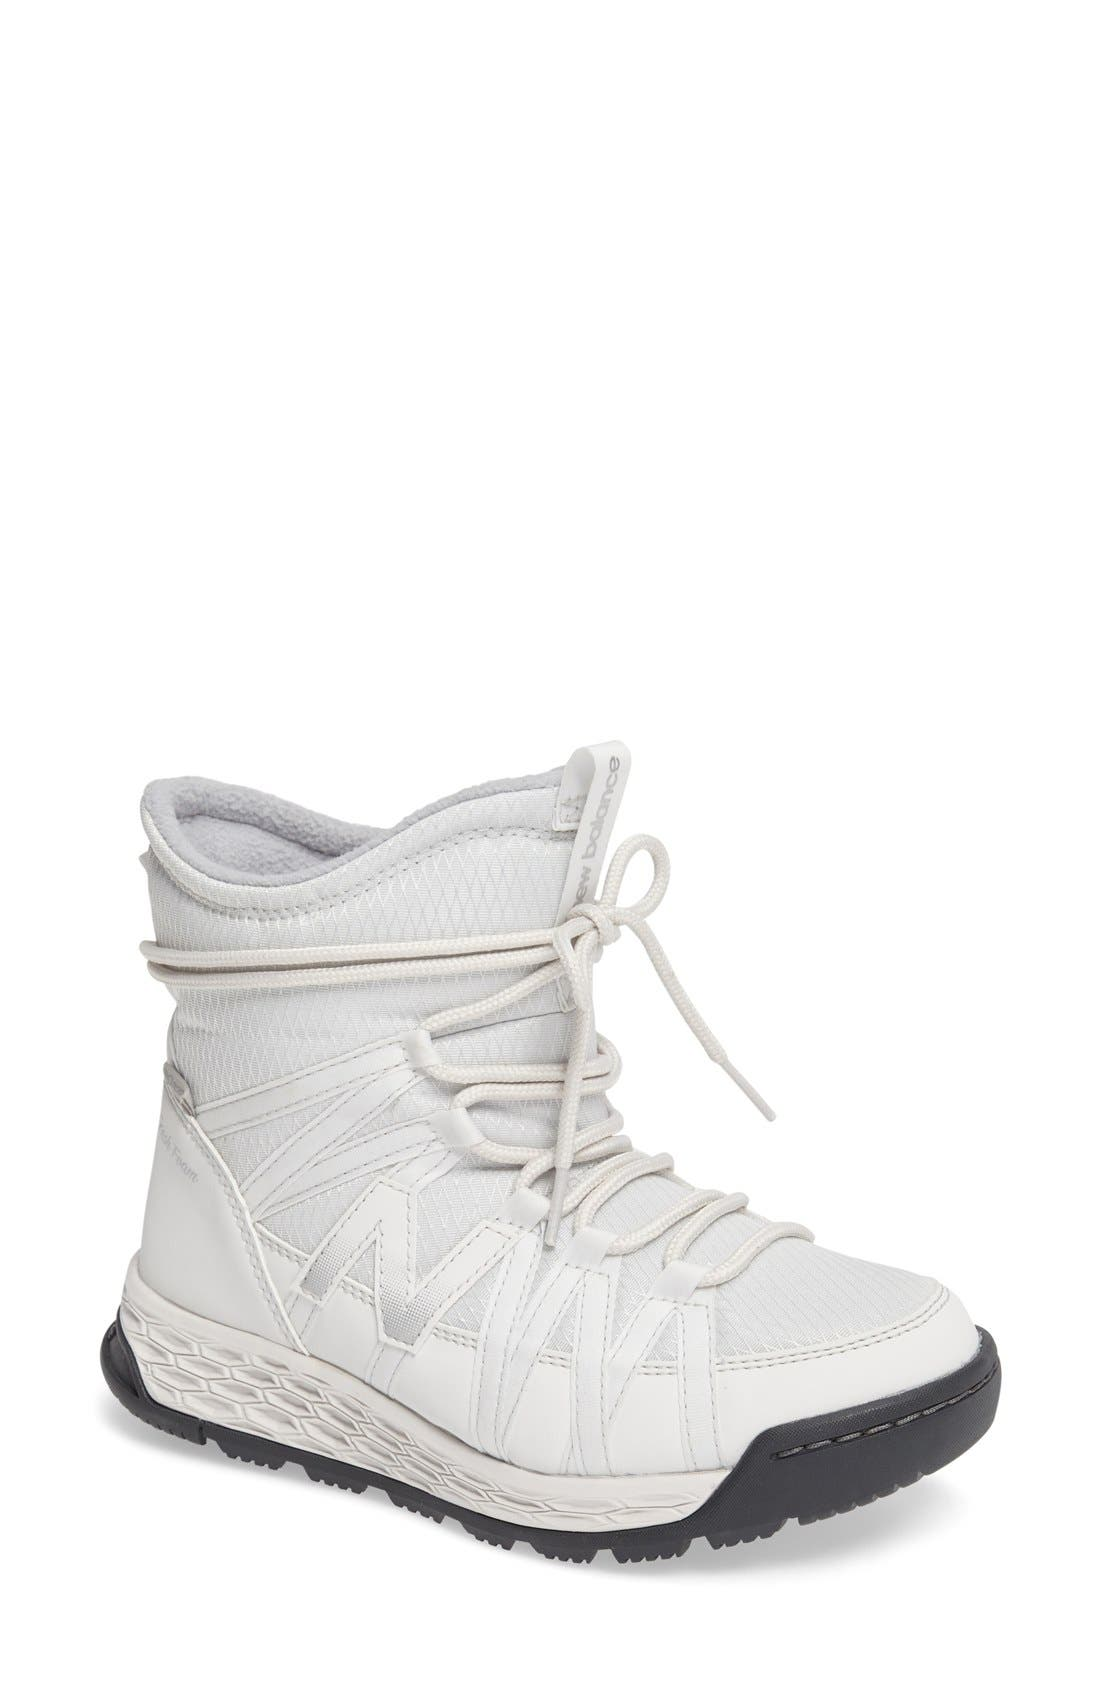 Q416 Weatherproof Snow Boot,                         Main,                         color, White